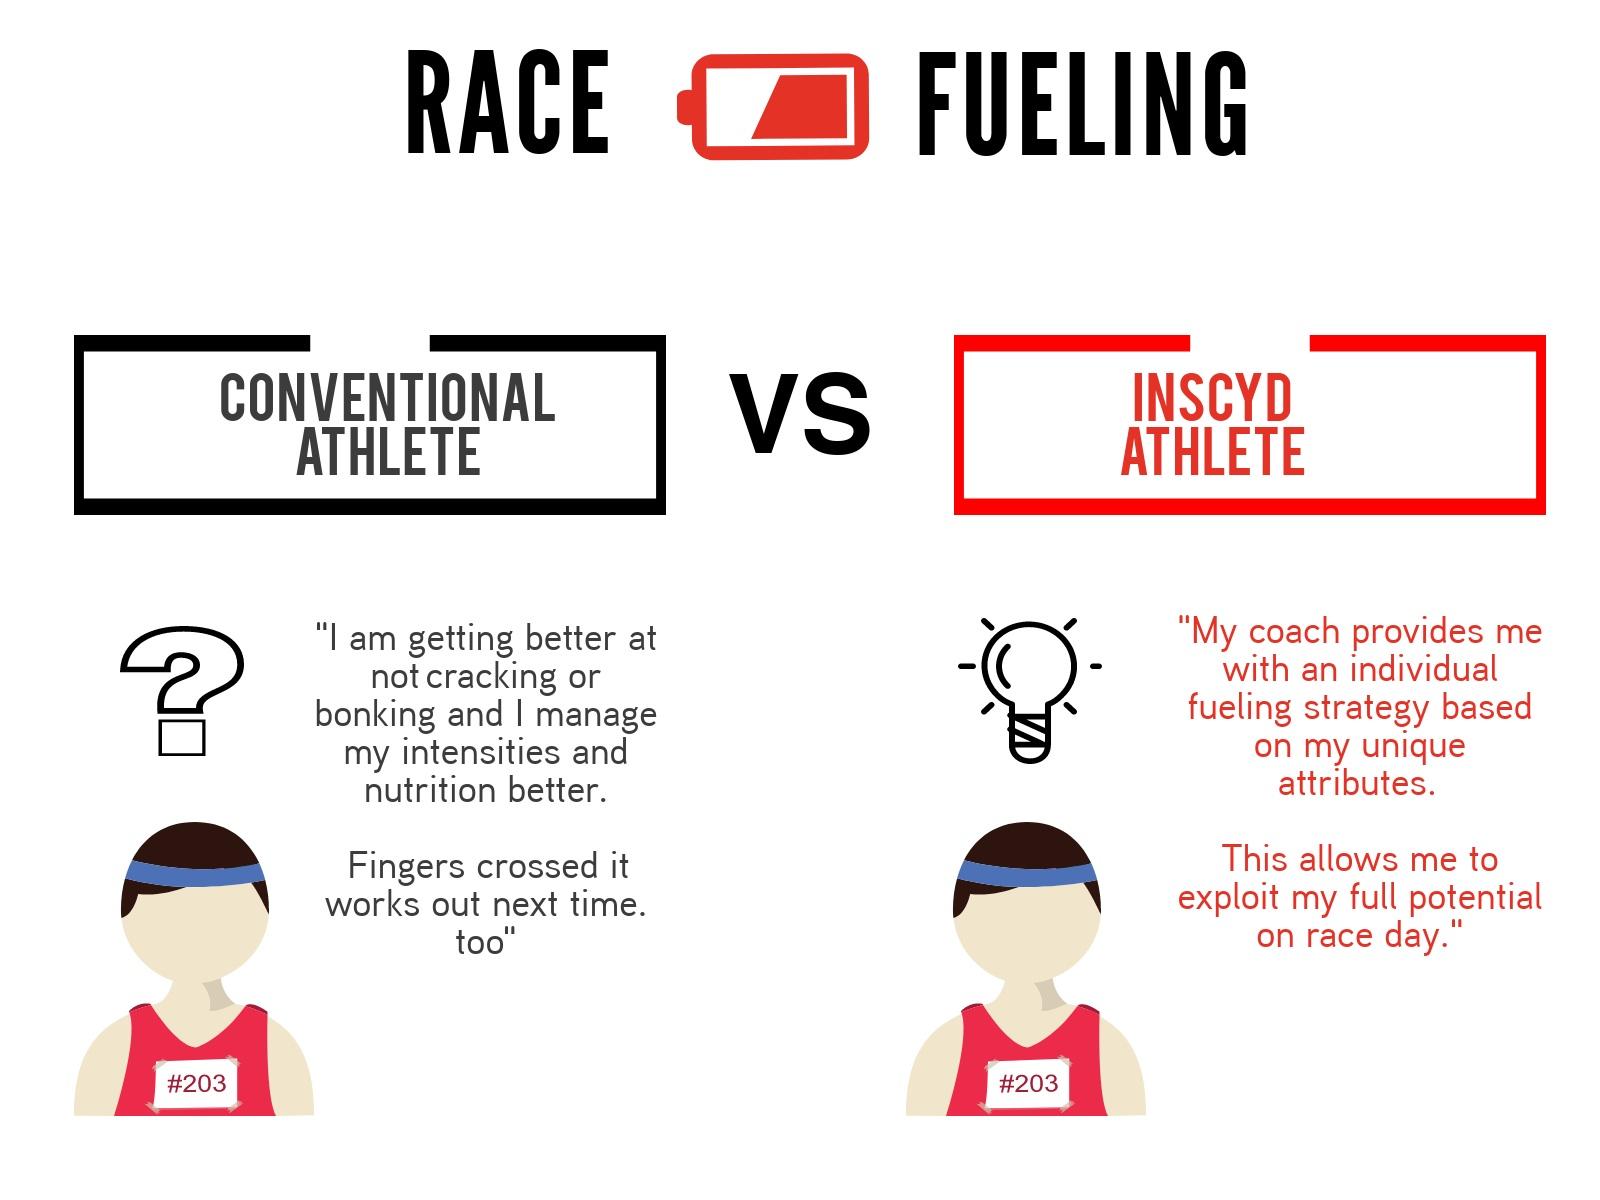 Benefits-Athlete-fueling.jpg